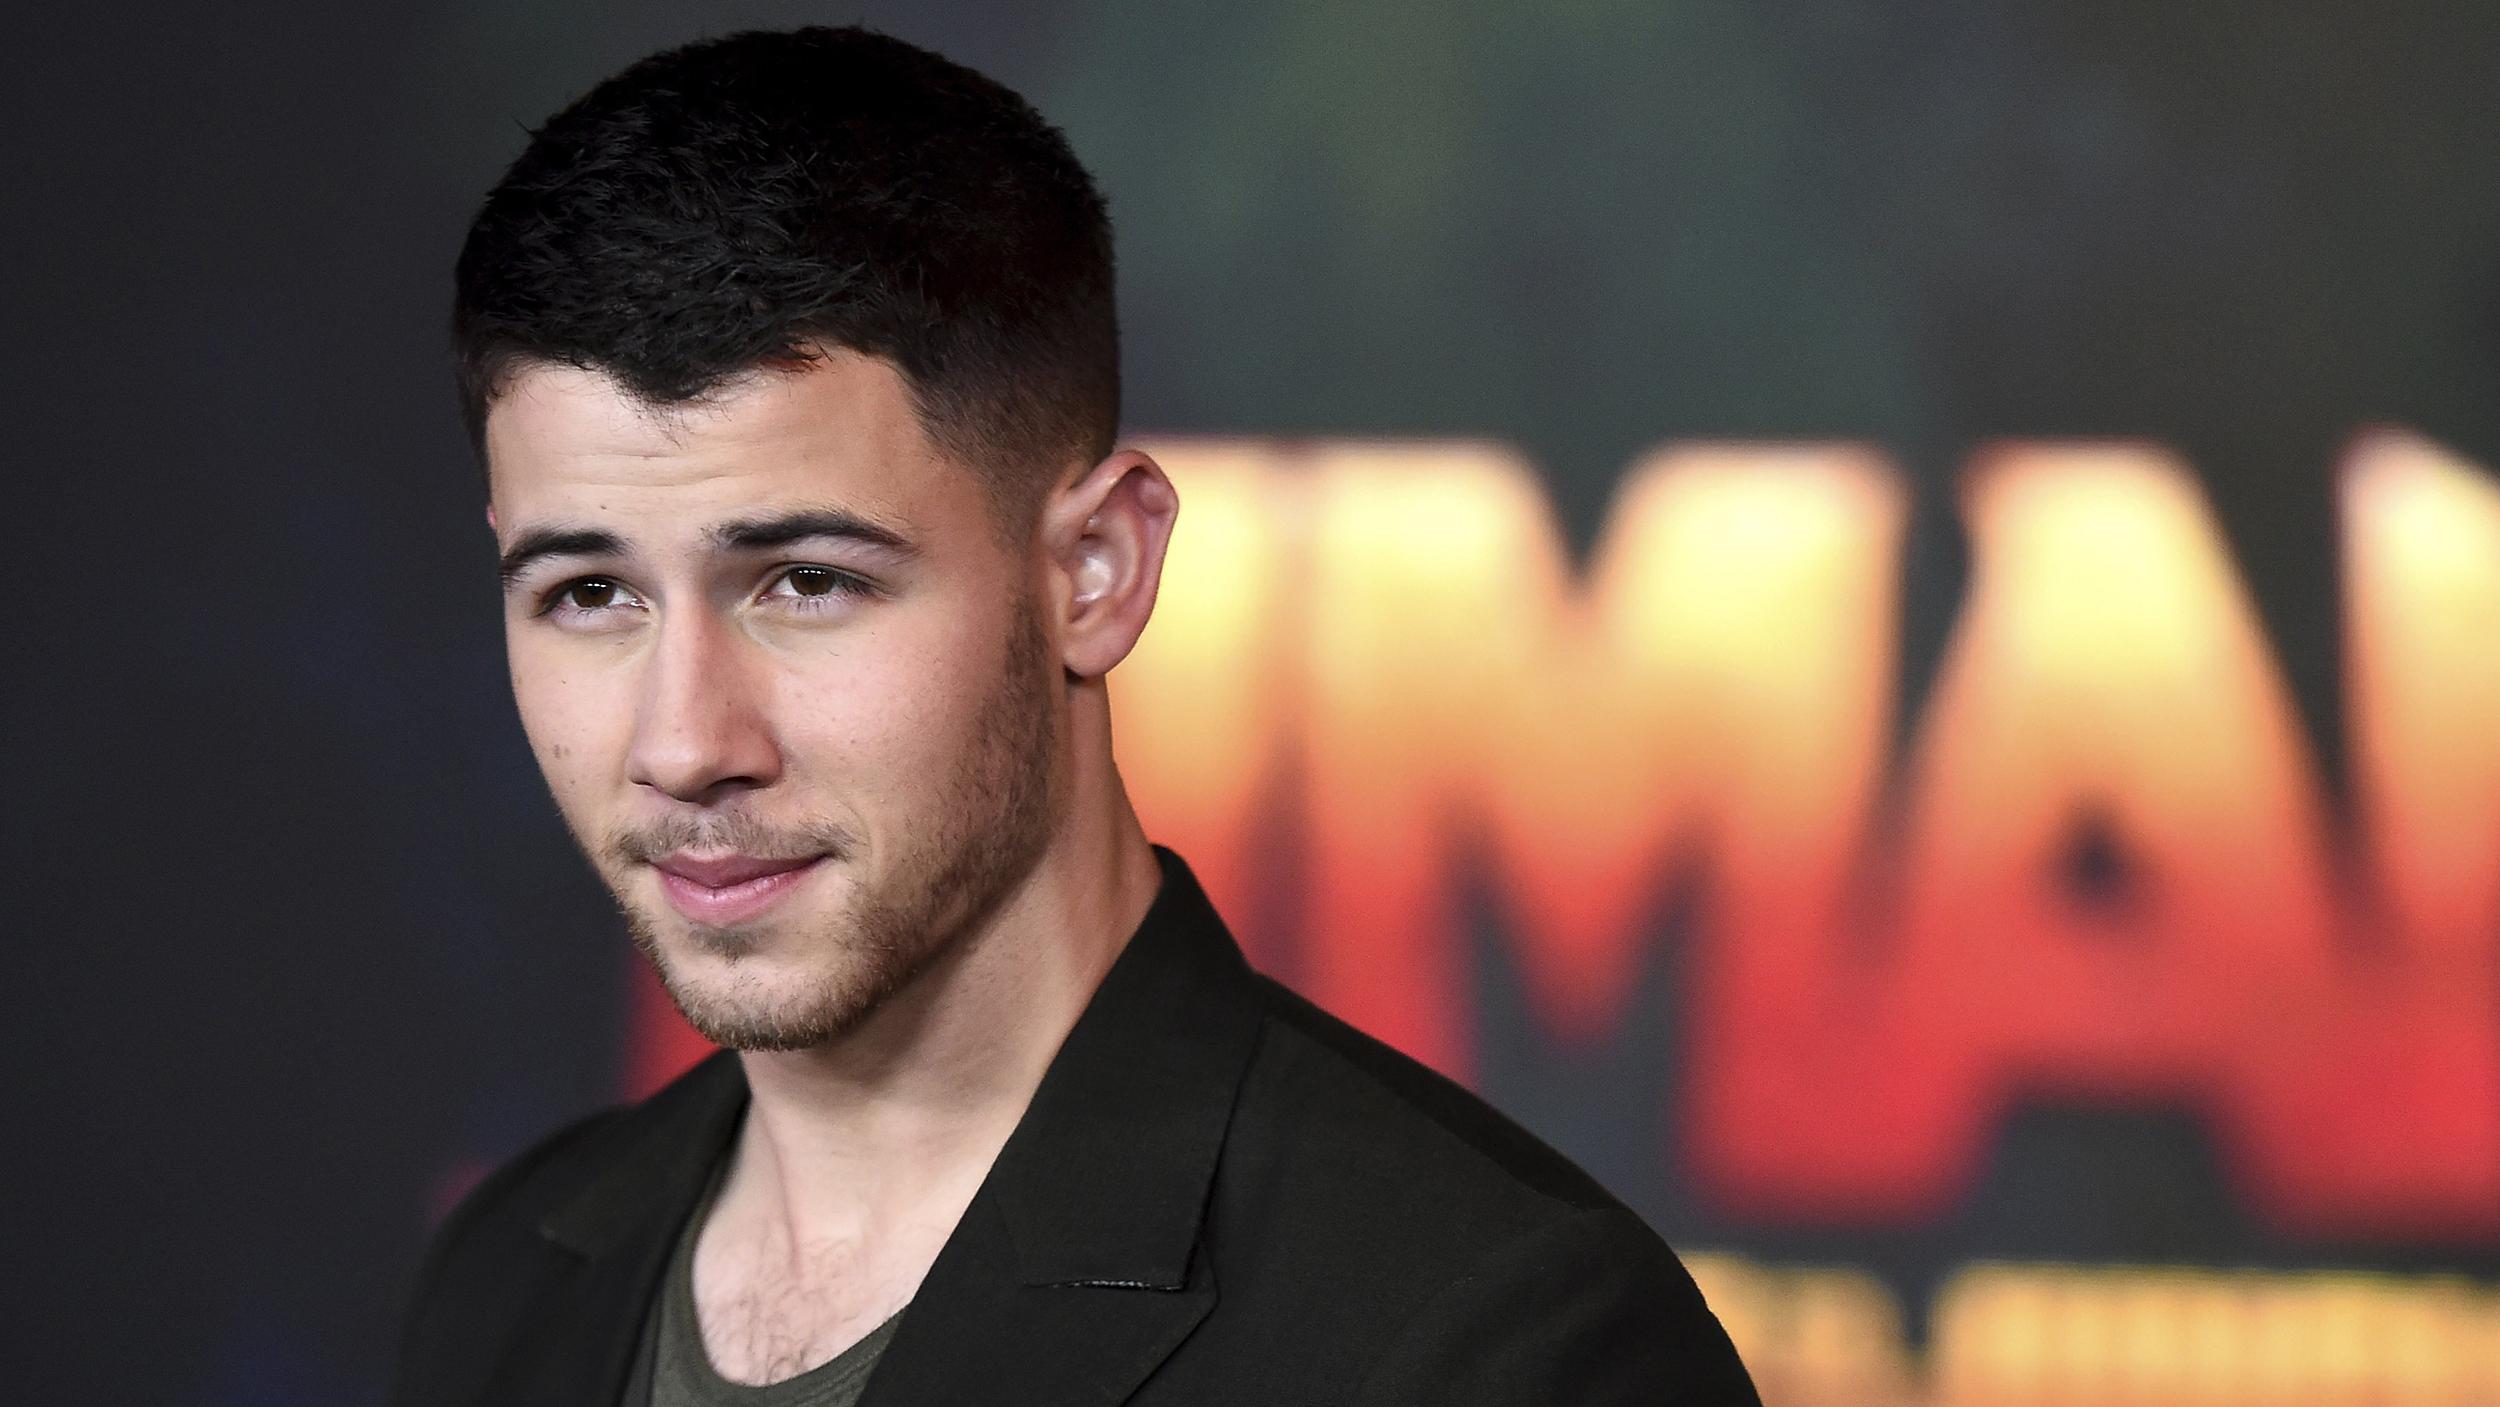 Nick Jonas reveals the importance of choosing your breakfast buddies